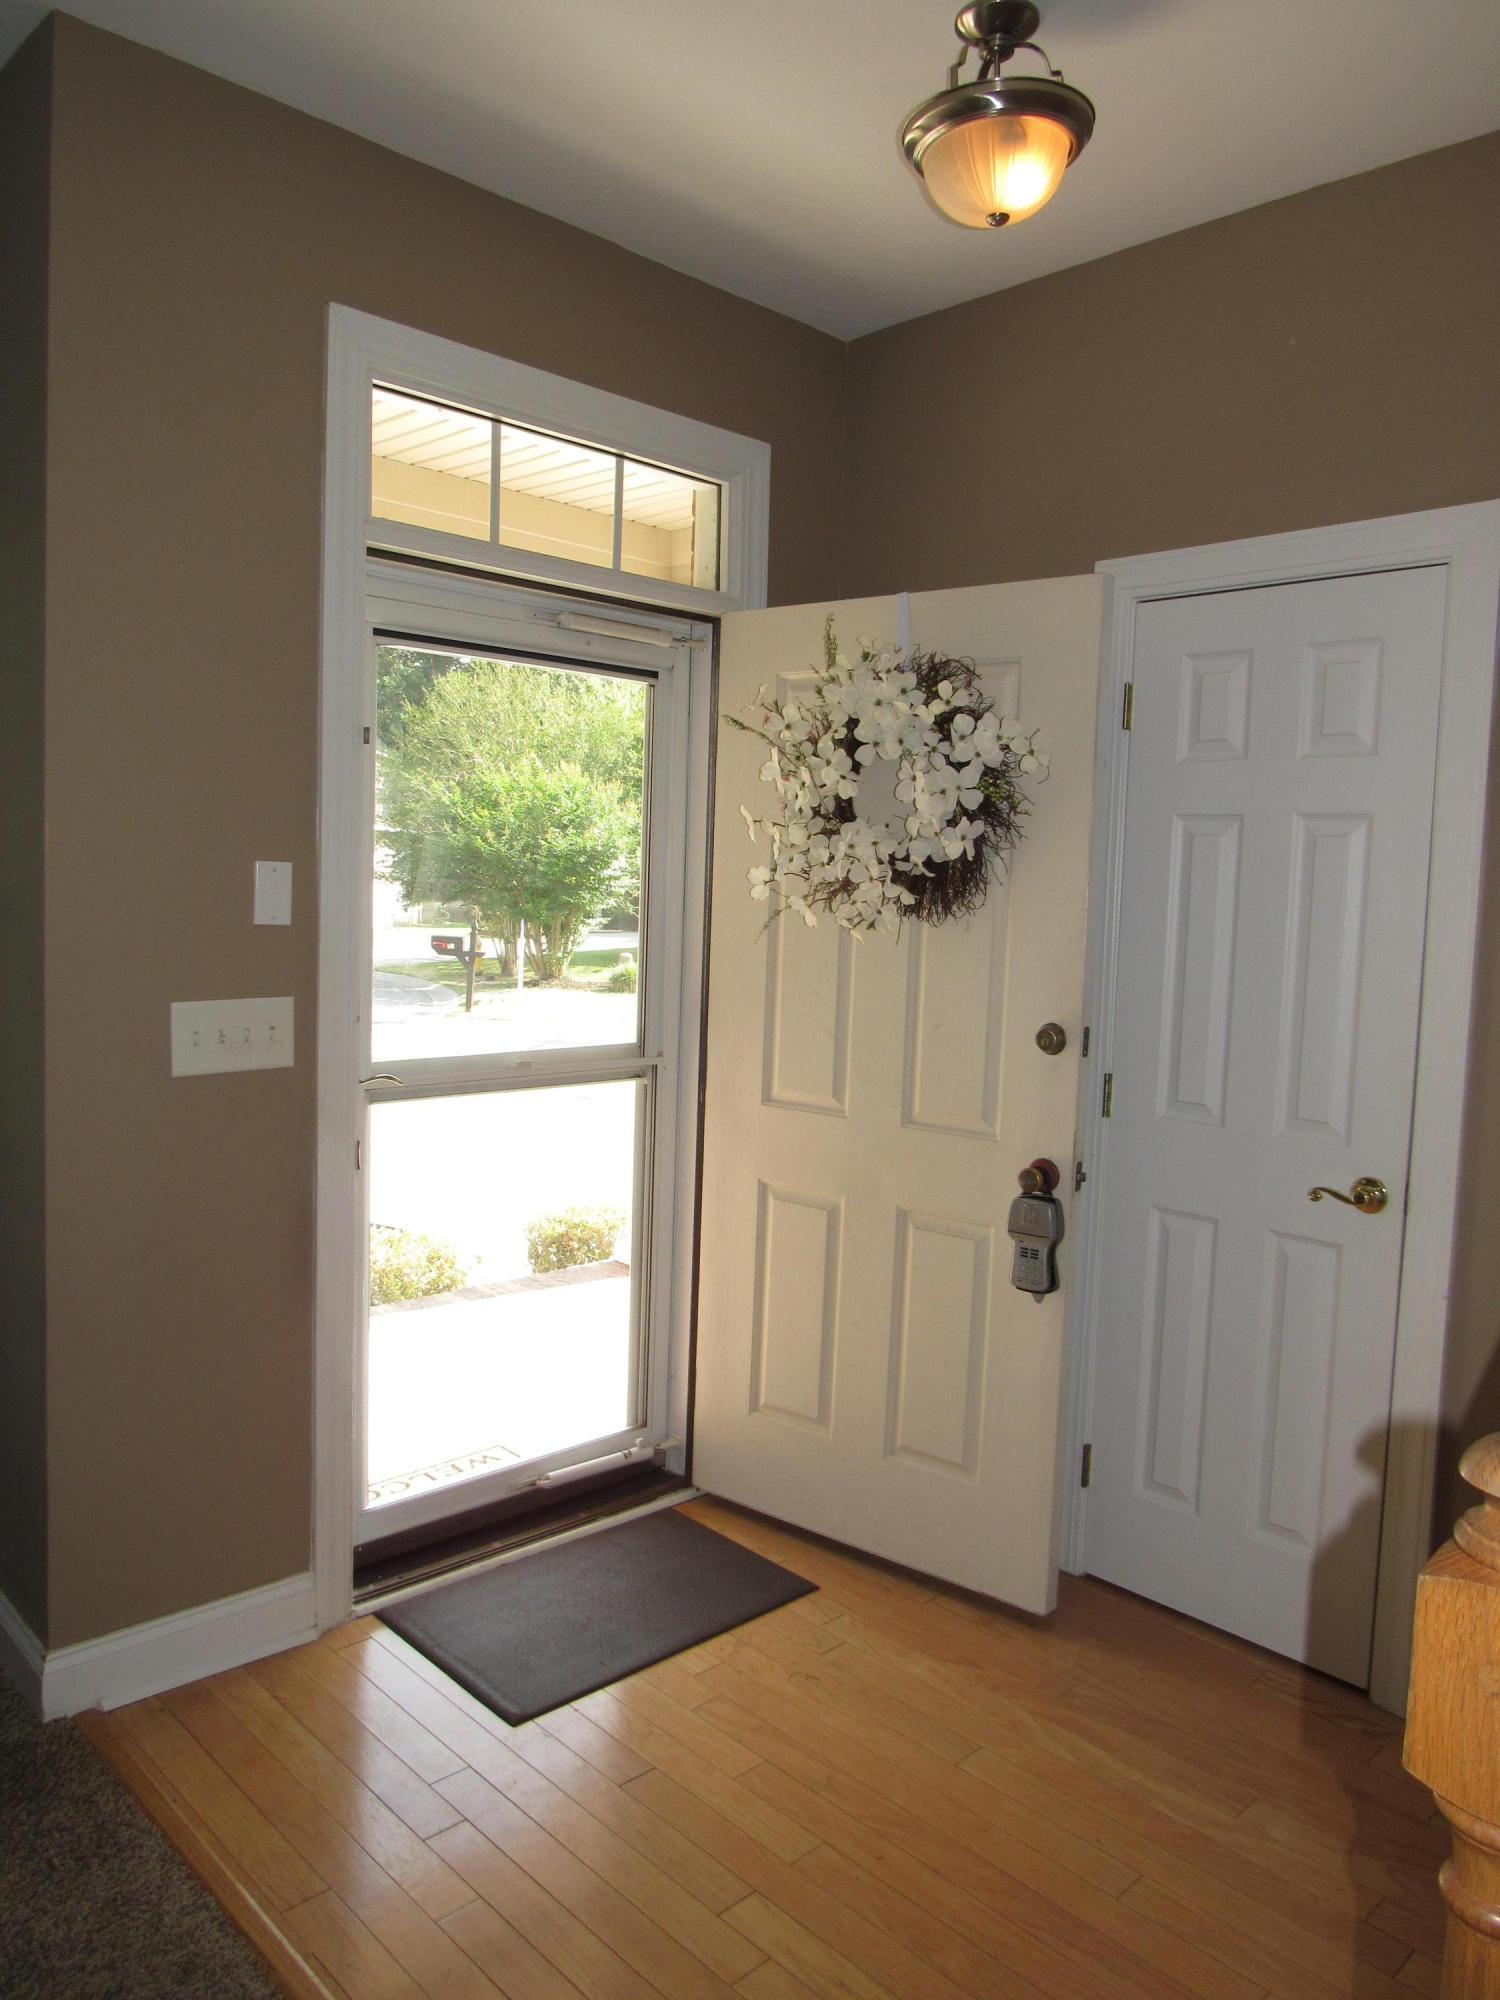 Summer Ridge Homes For Sale - 138 Northpark, Summerville, SC - 1